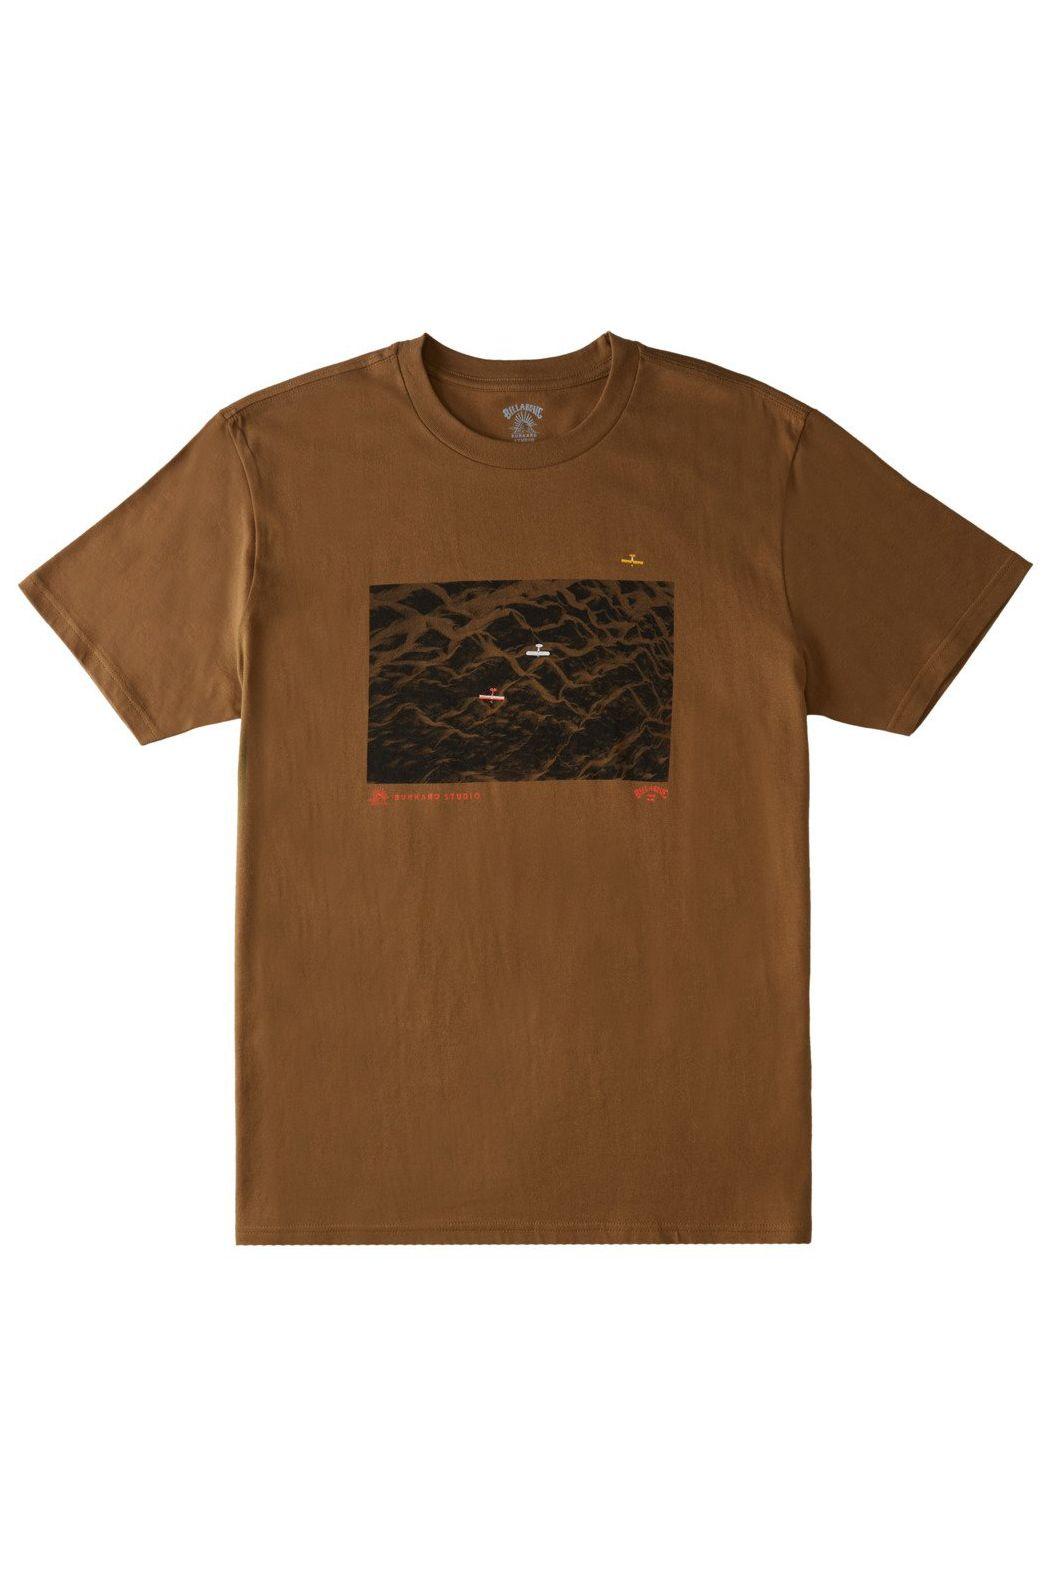 Billabong T-Shirt GLACIER RUNOFF AERIA ADIV / CHRIS BURKARD Bison